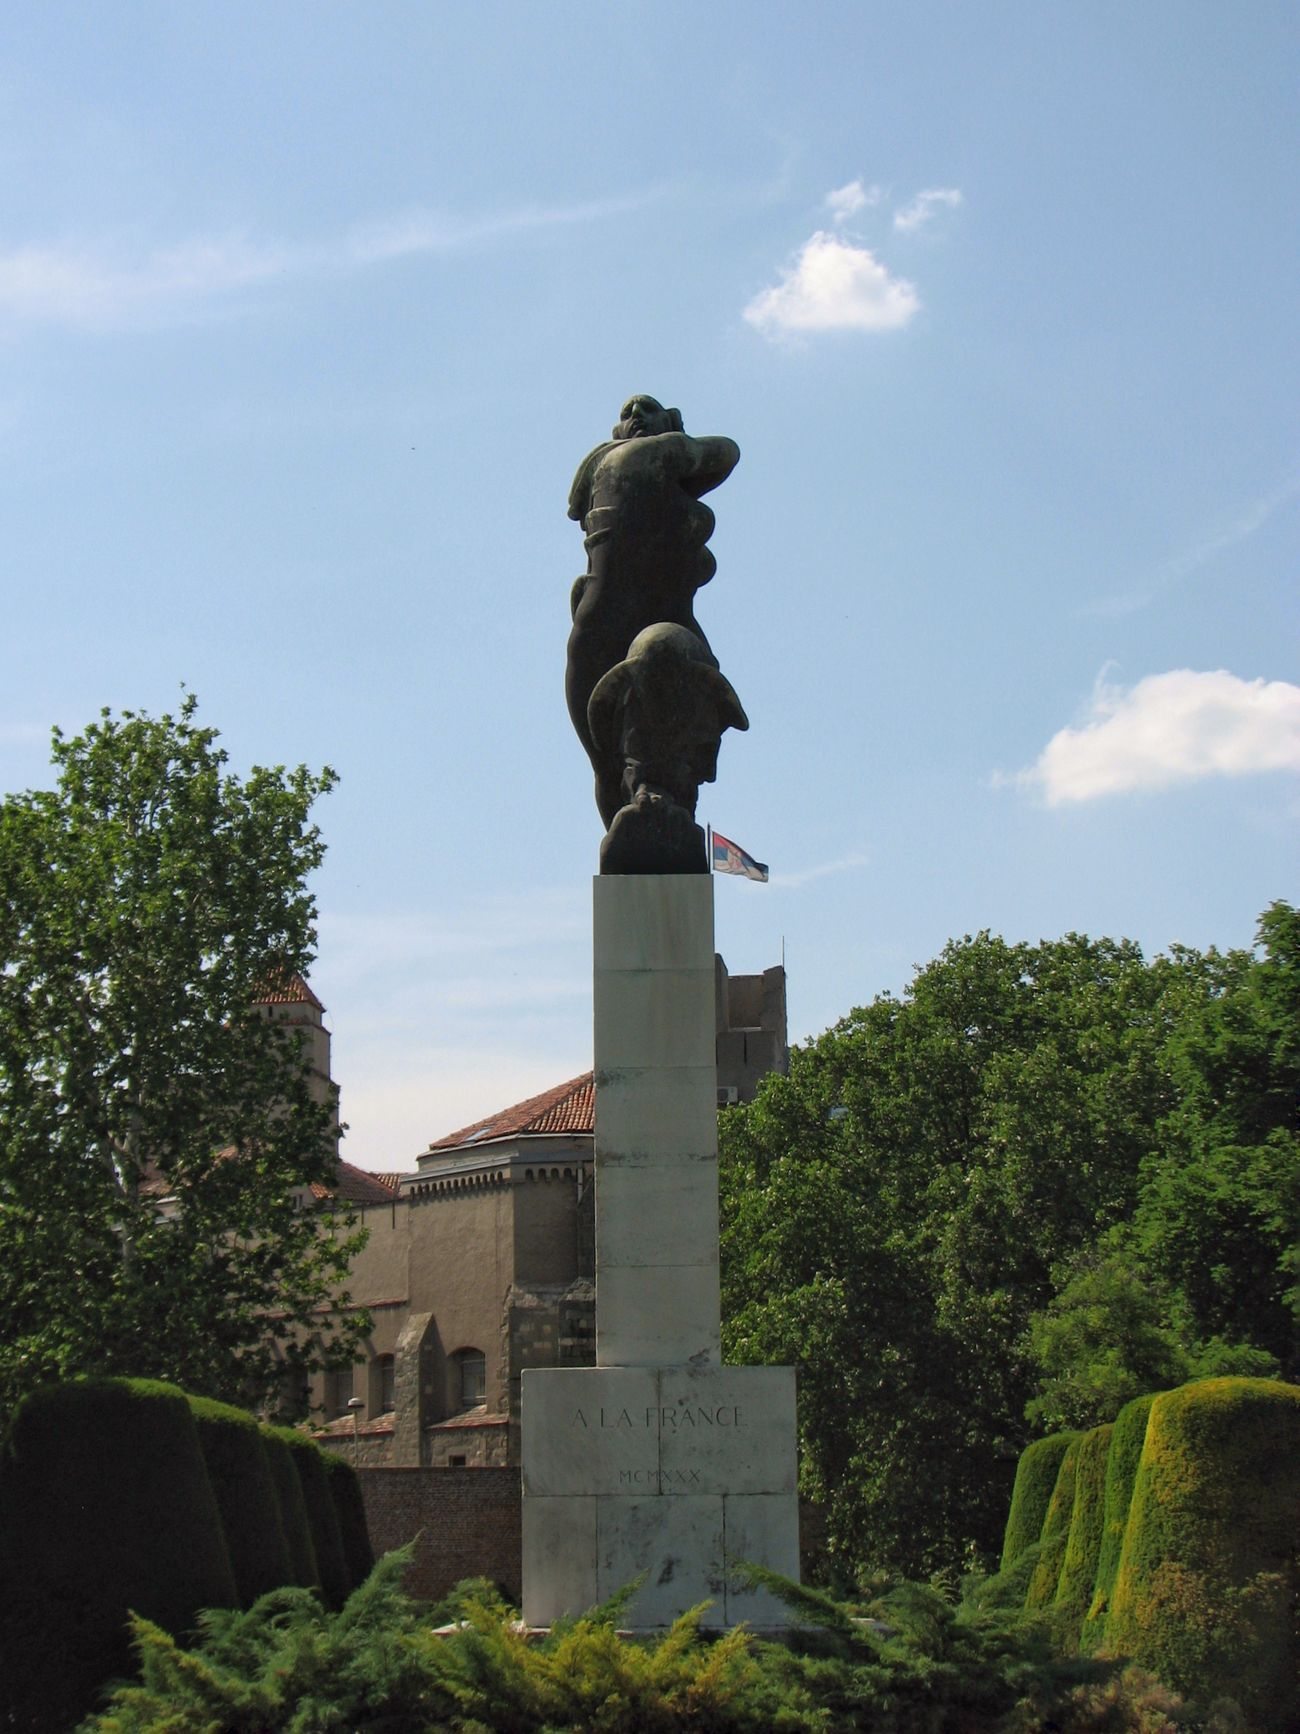 Monument No People Statue Sky City Sculpture Reconnaissance A La France World War I Memory Memorial Serbia Yugoslavia Kalemegdan  Belgrade